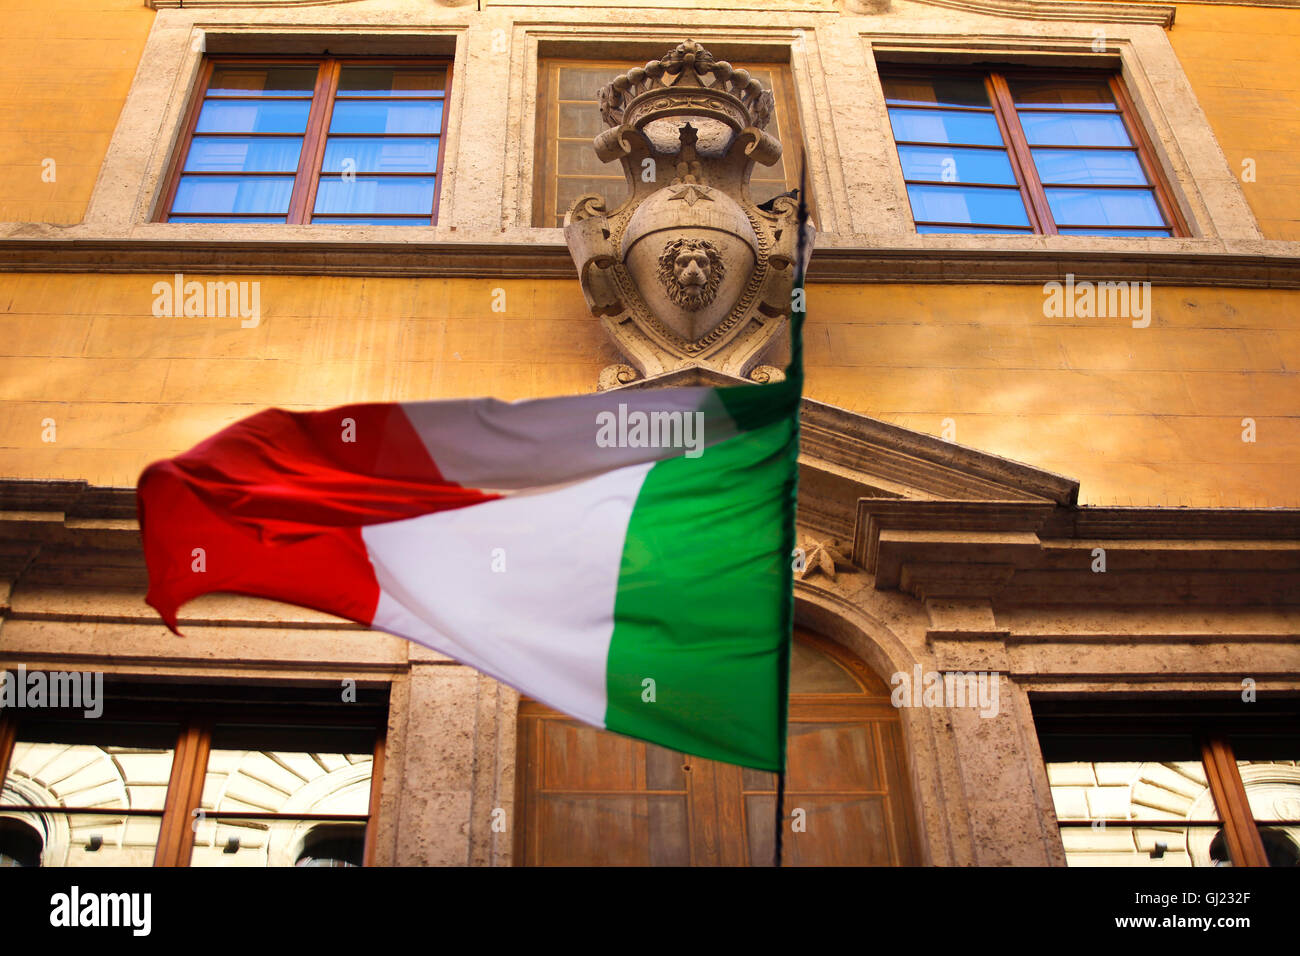 Italienische Flagge auf Via Banchi di Sopra in Siena, Italien. Stockbild